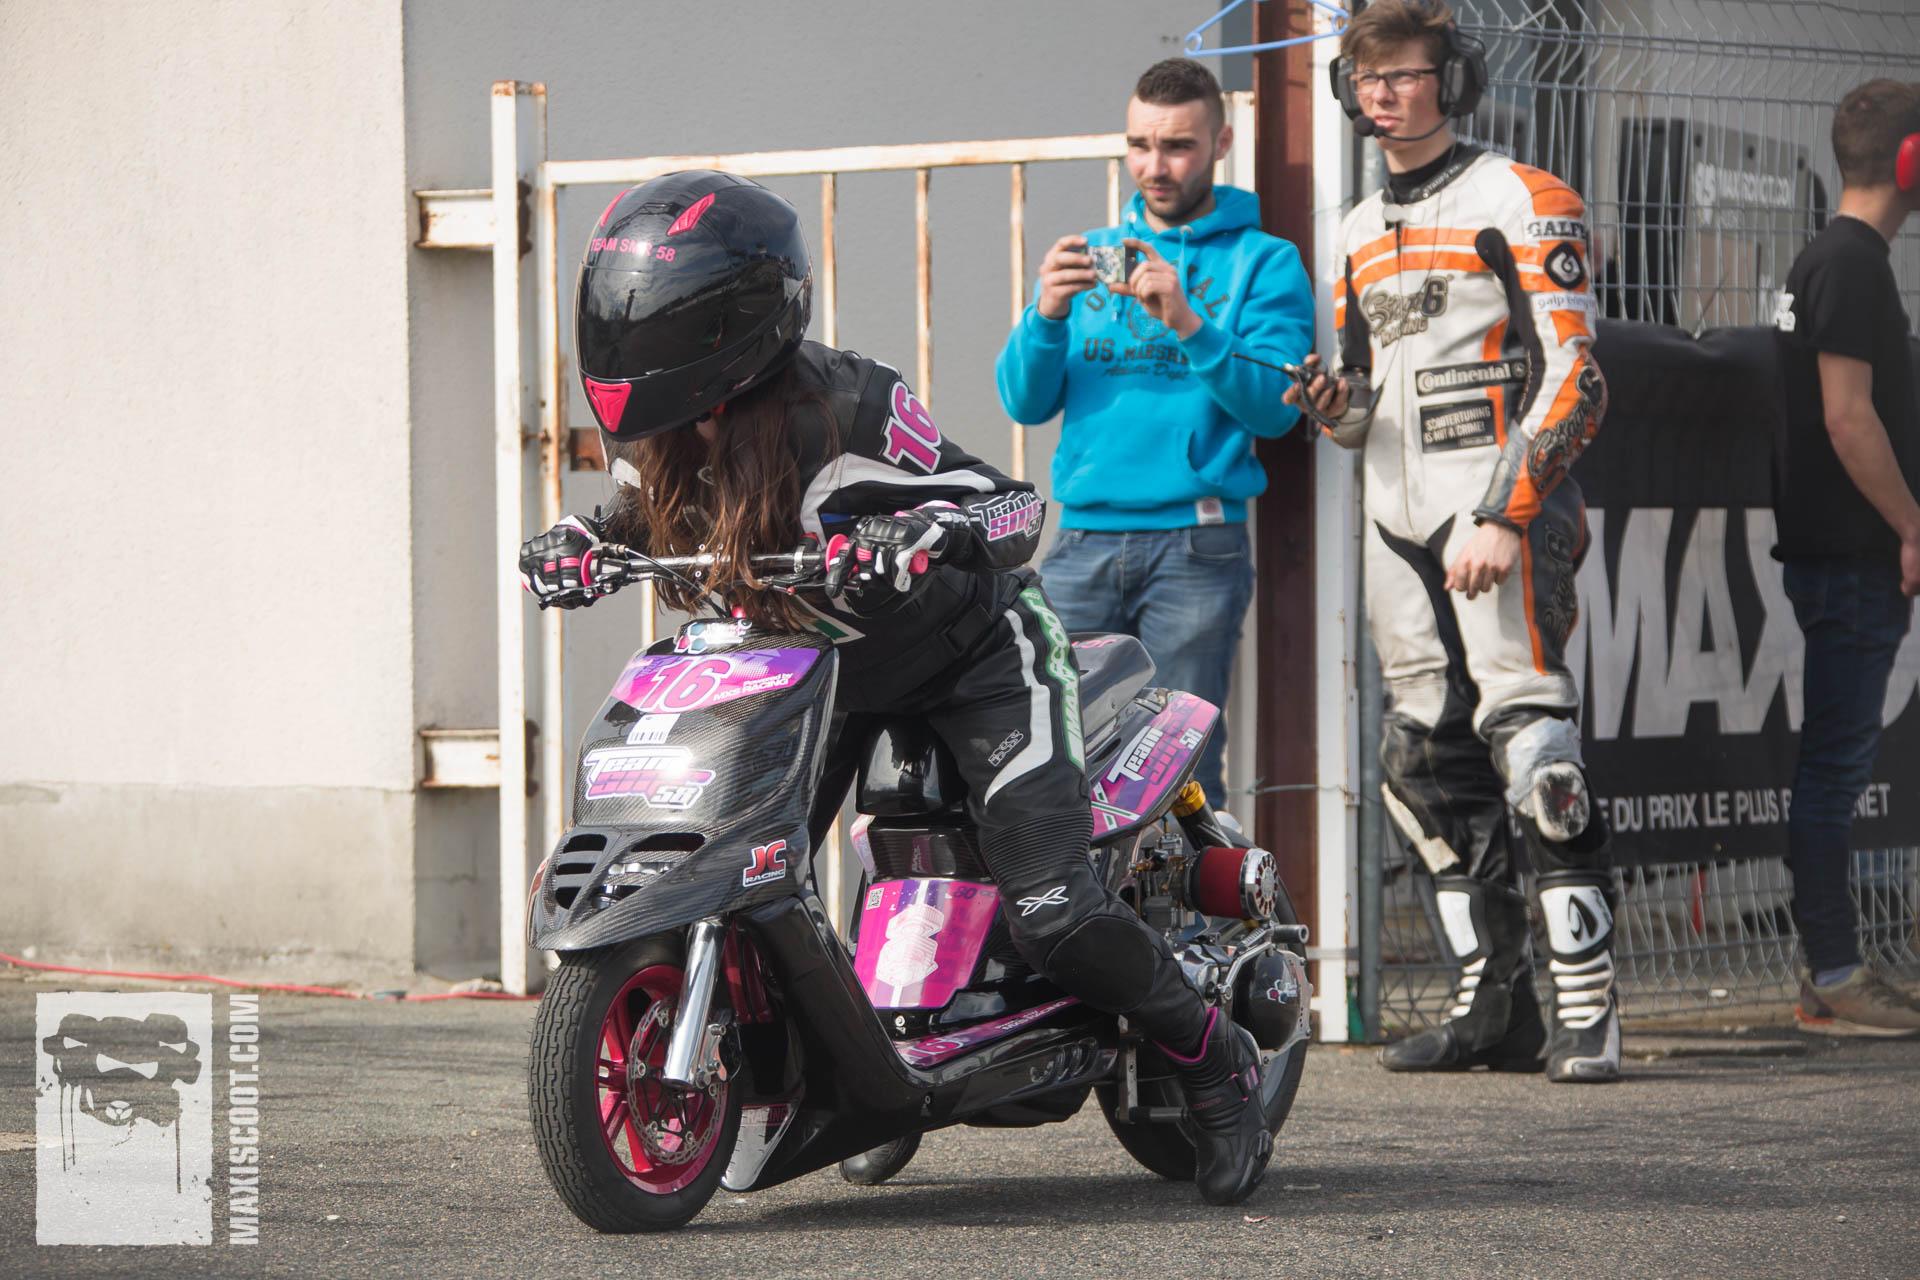 MXS Racing racing riders